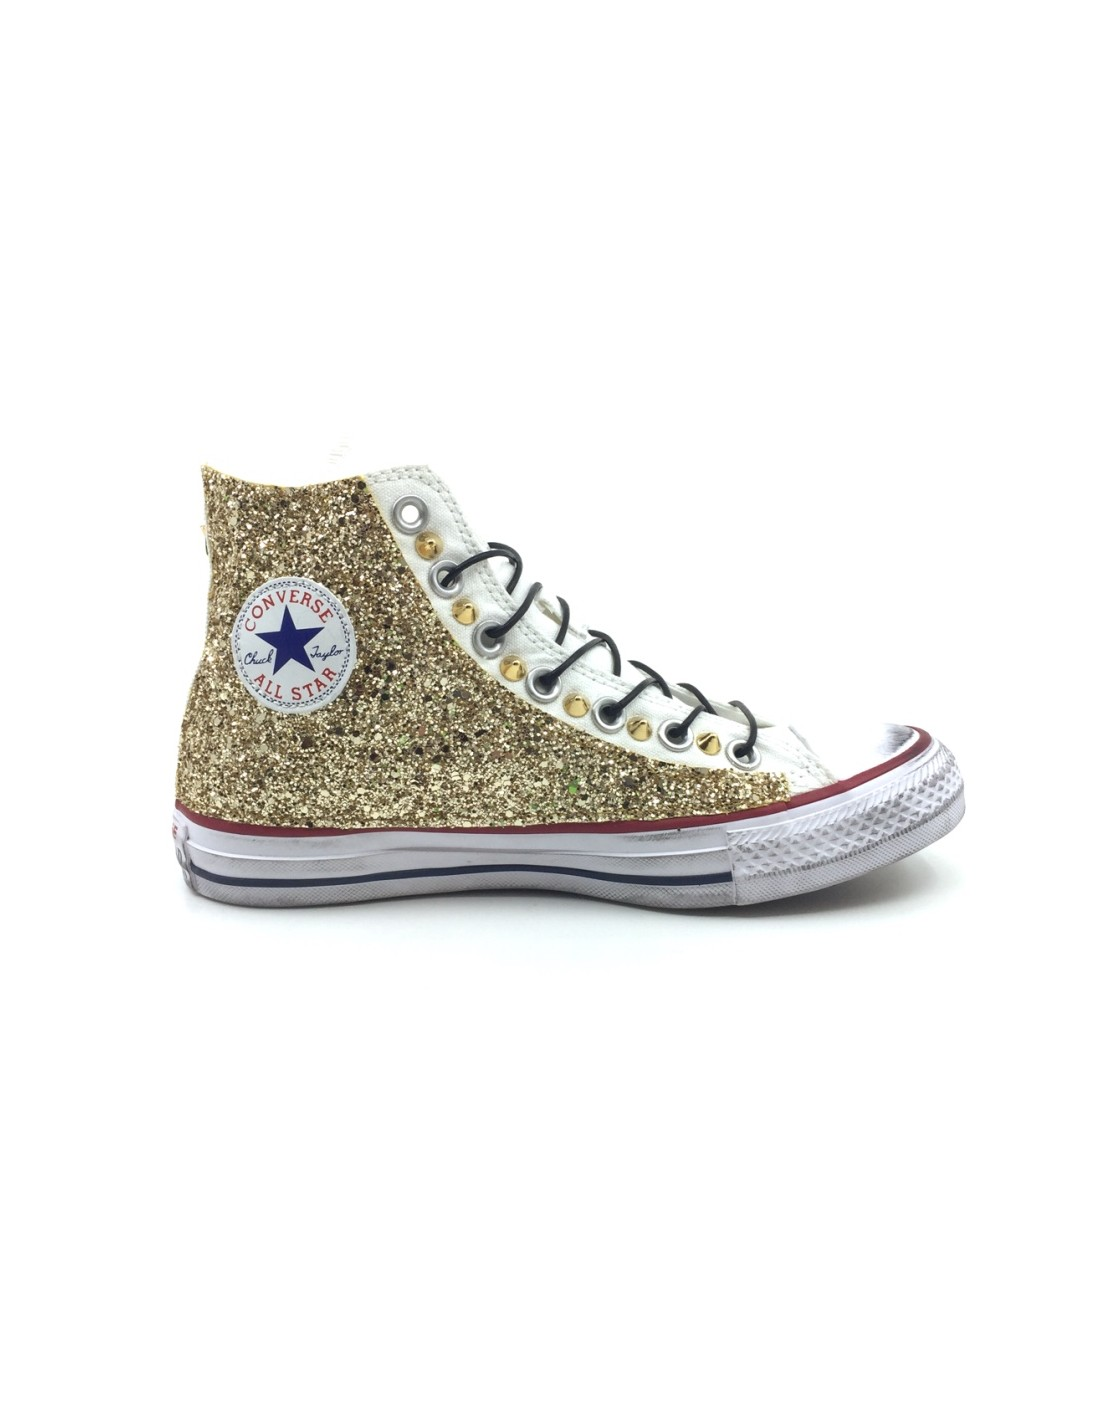 Converse AllStar Bianca Glitter